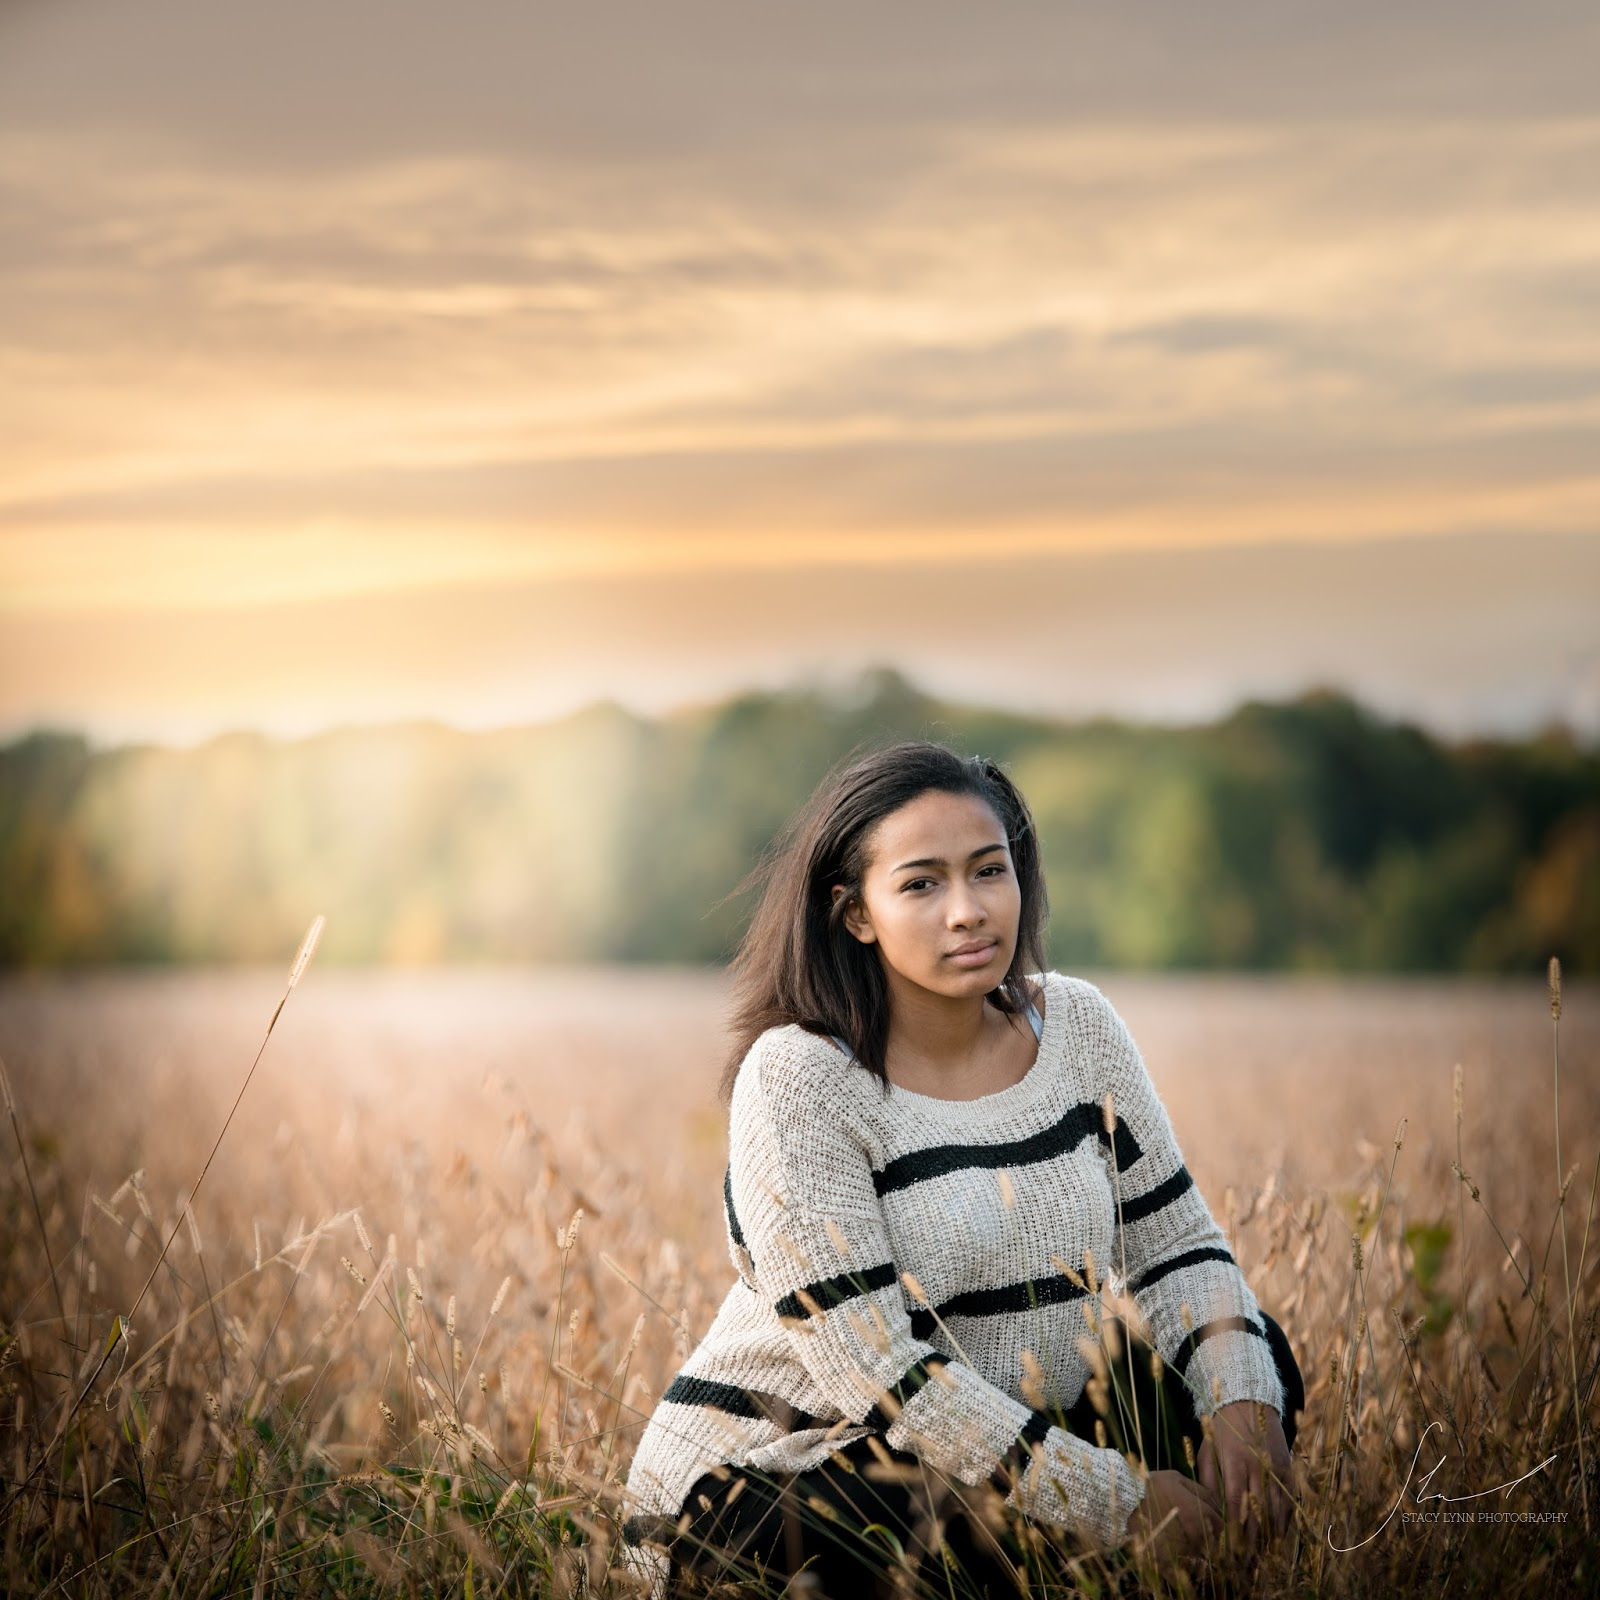 senior photography phelps ny sunset wheat field